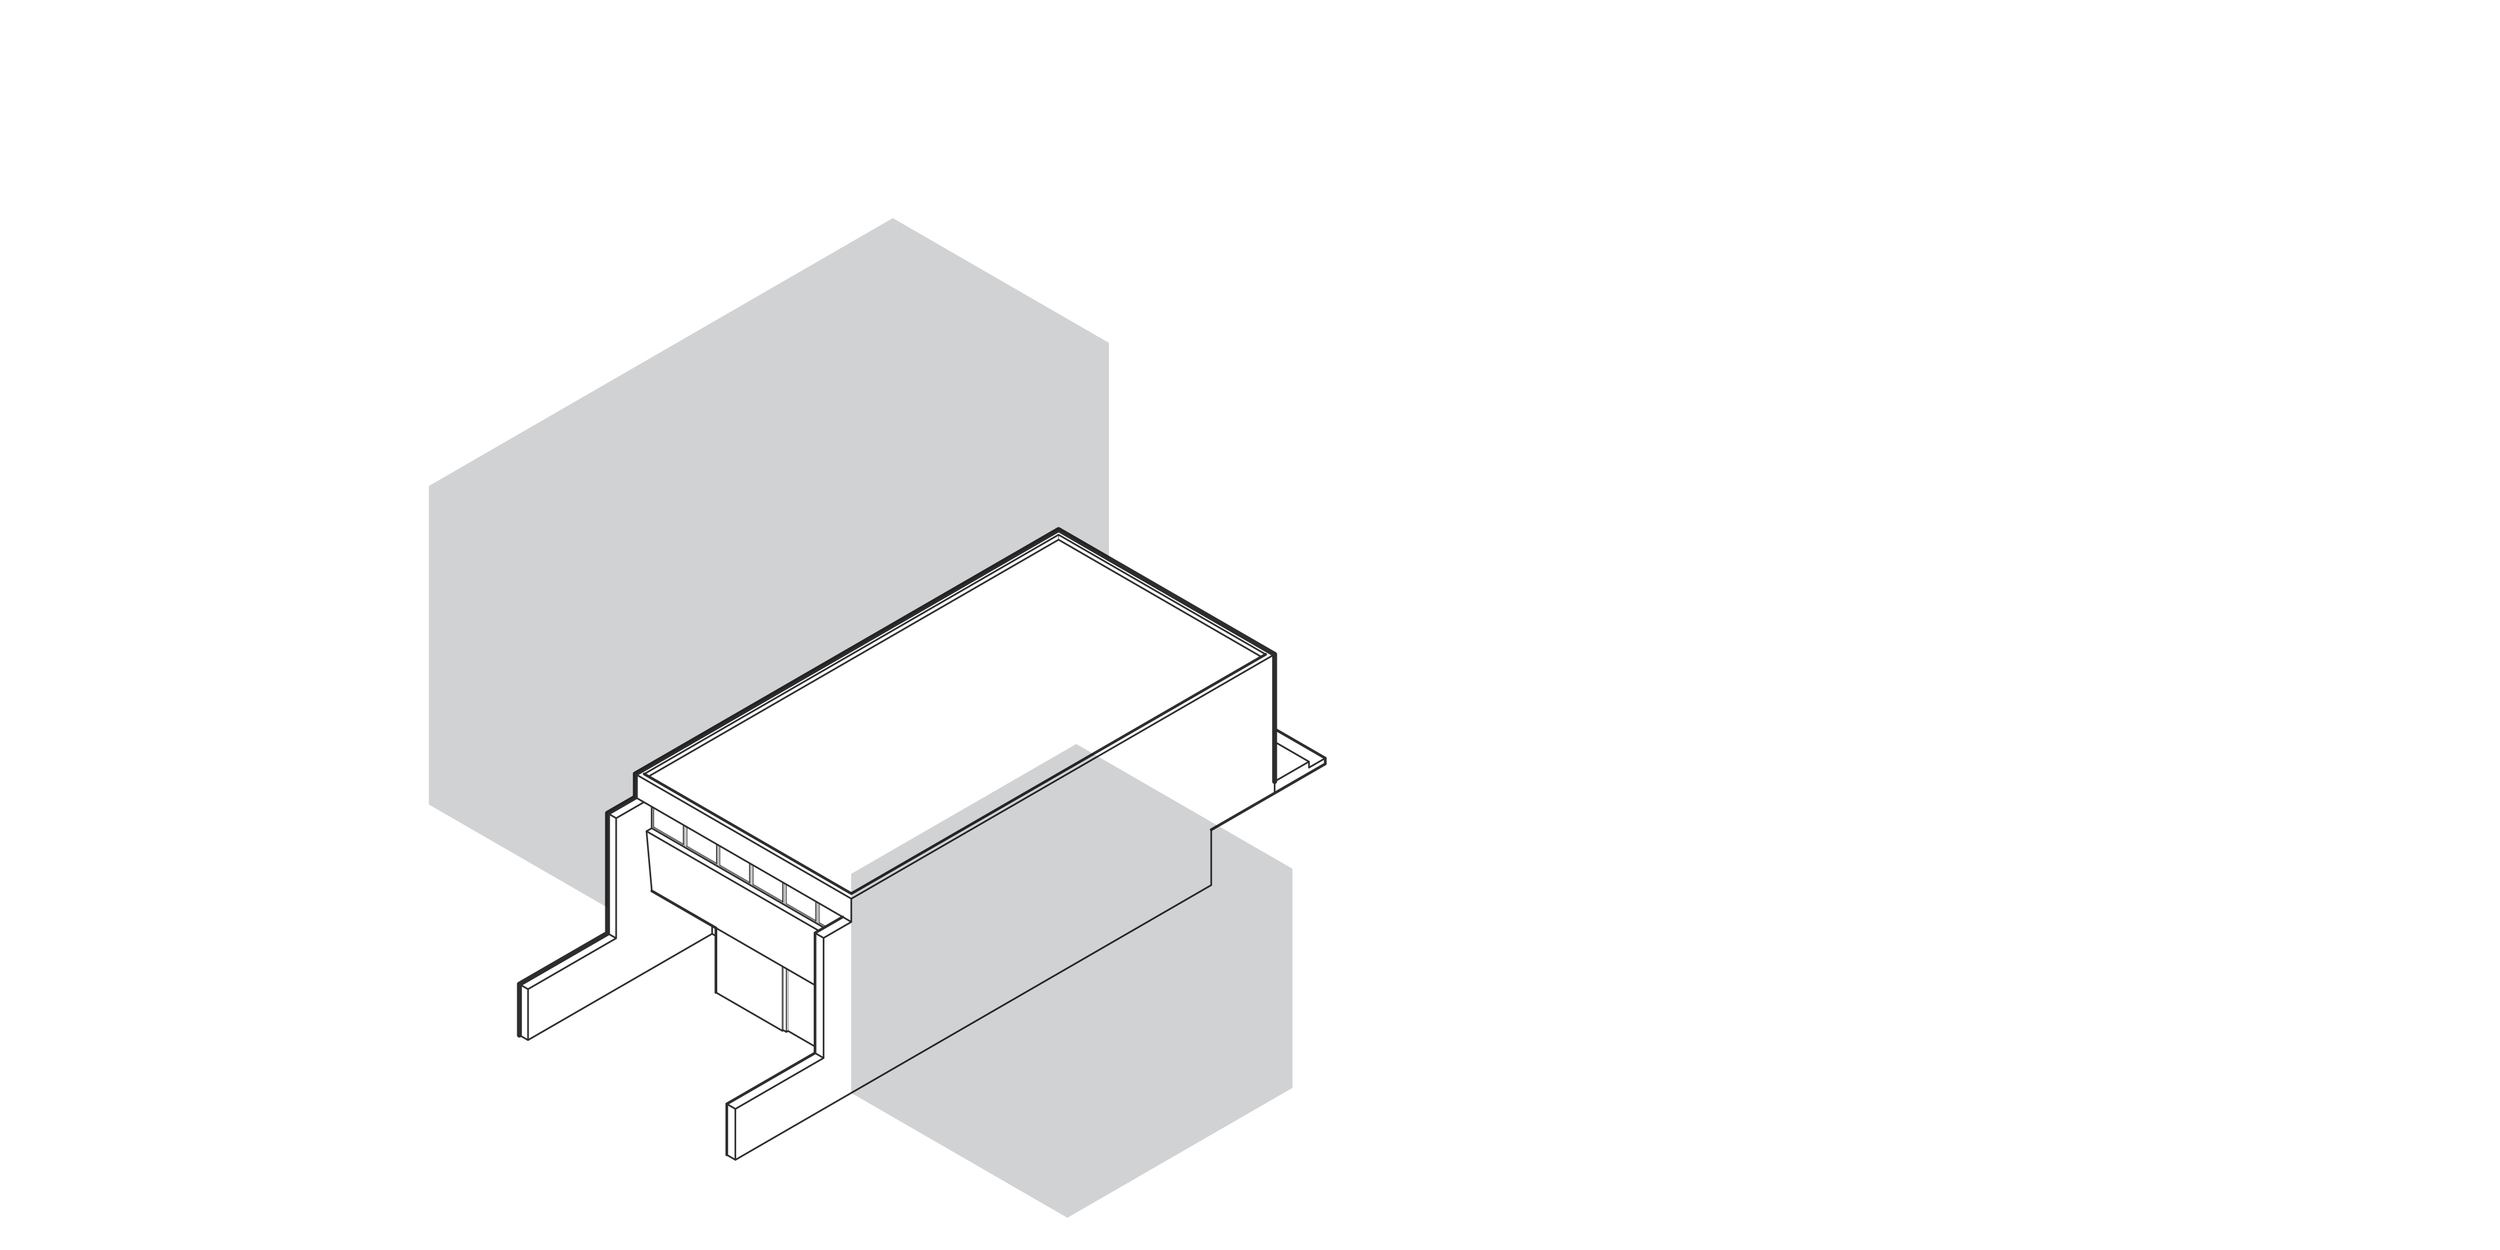 57_Highland-160413-Diagram-02-01.jpg